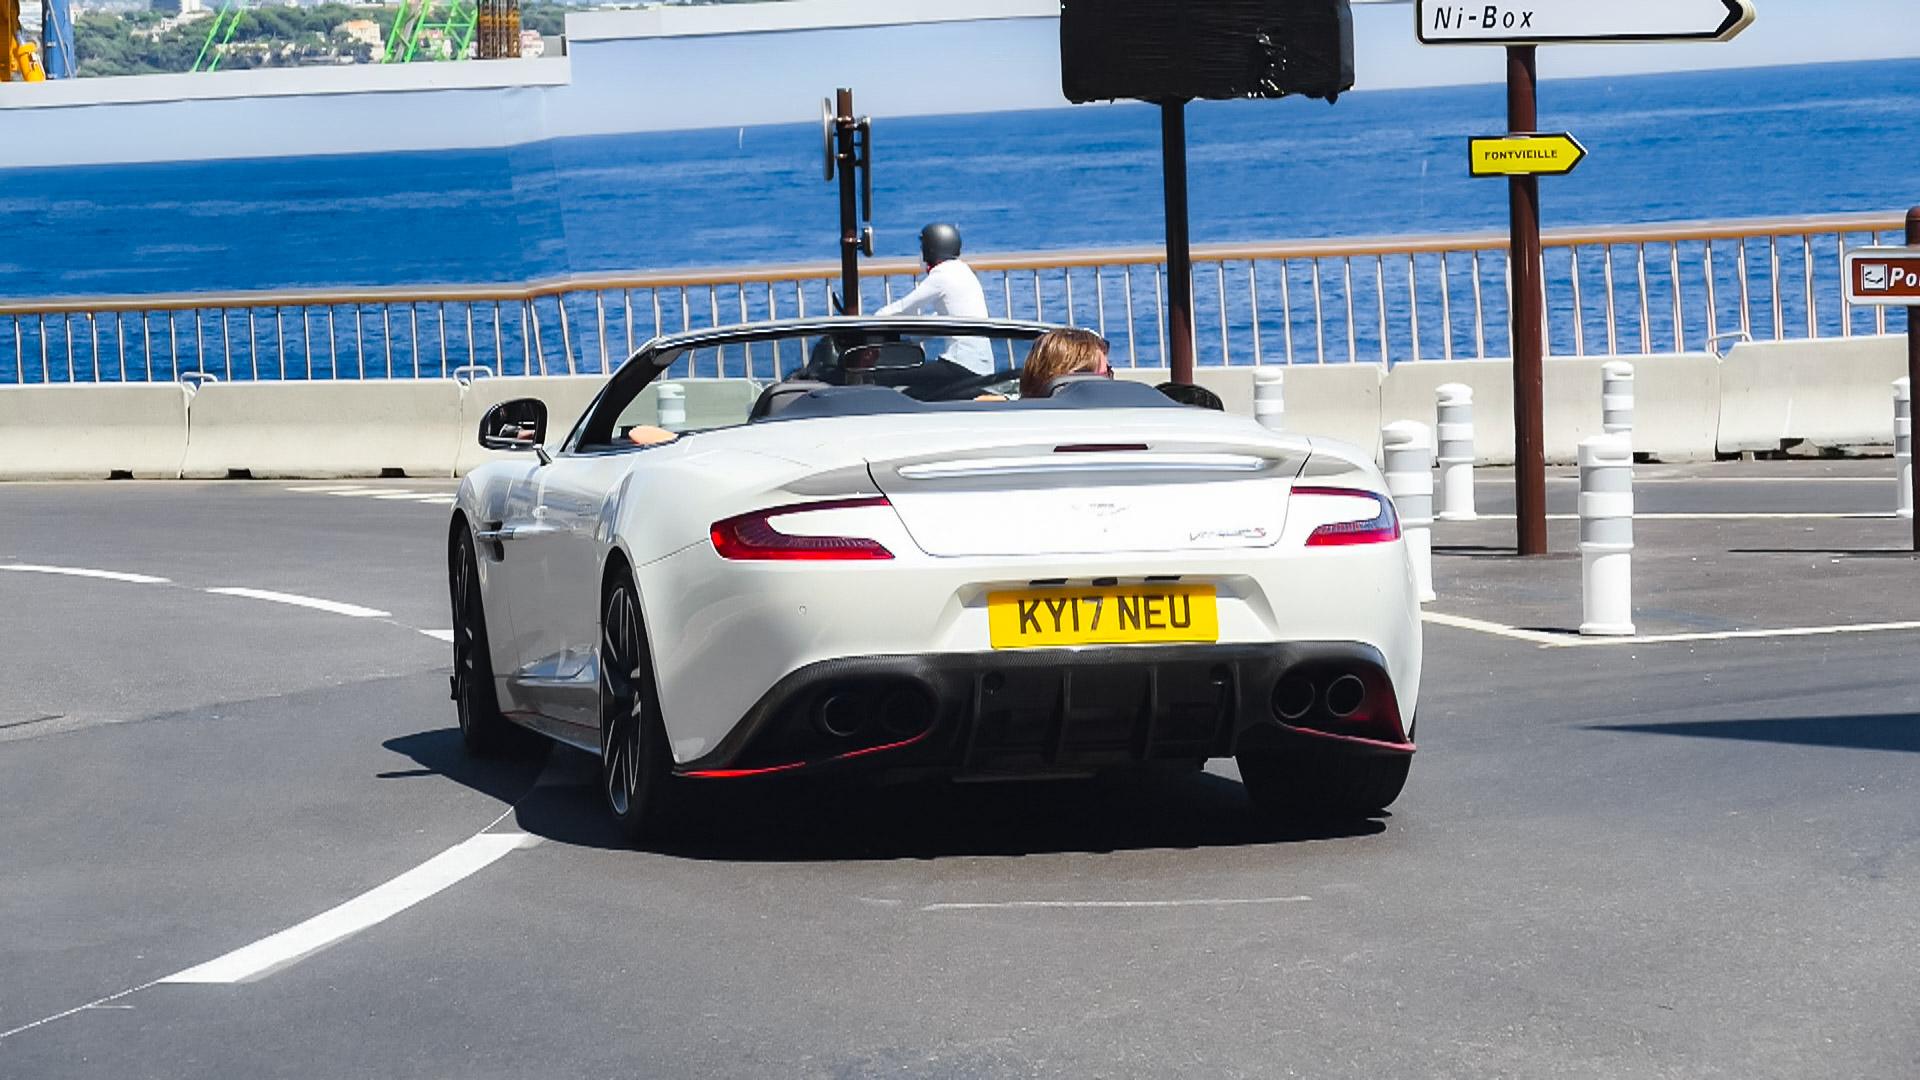 Aston Martin Vanquish S Volante - KY17-NEU (GB)